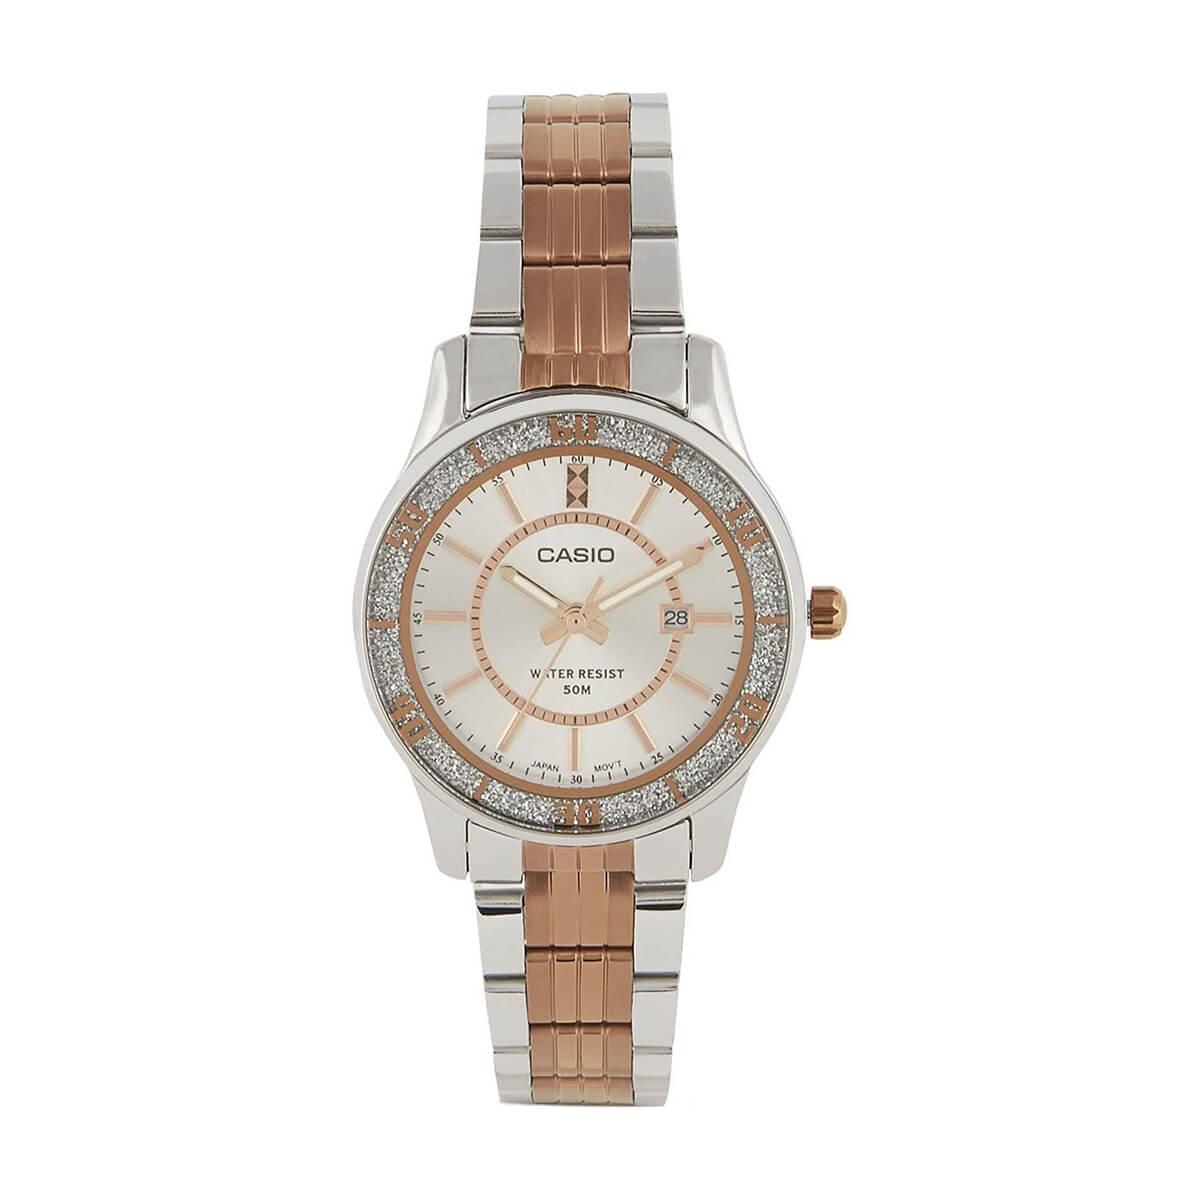 Часовник Casio LTP-1358RG-7AV